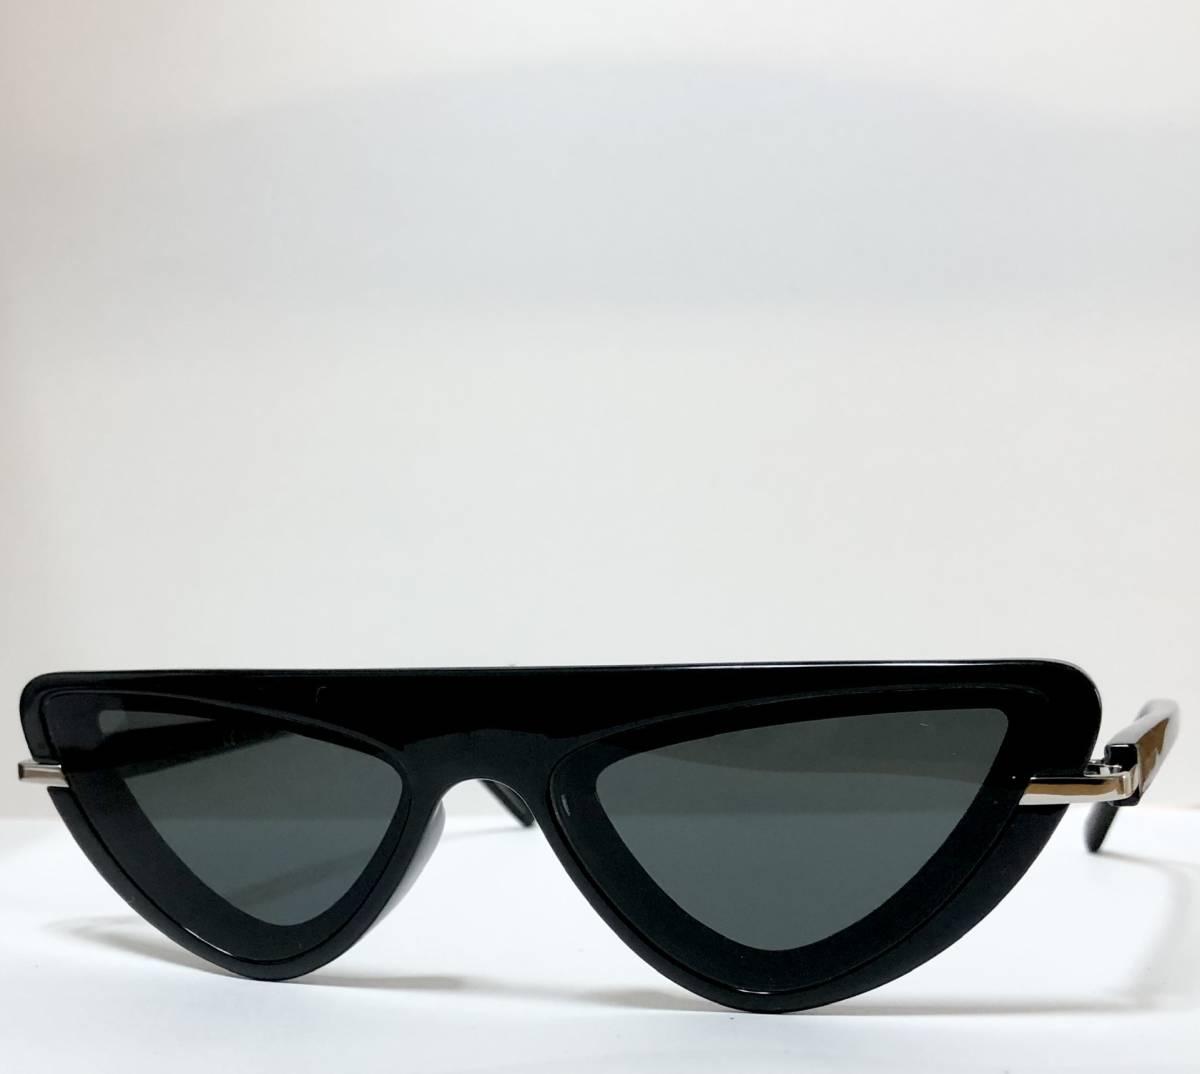 CK カルバンクライン 芸術的なサングラス イタリア製 純正・新品 ケース付き 米国ブランド Calvin Klein メガネ可能_画像2